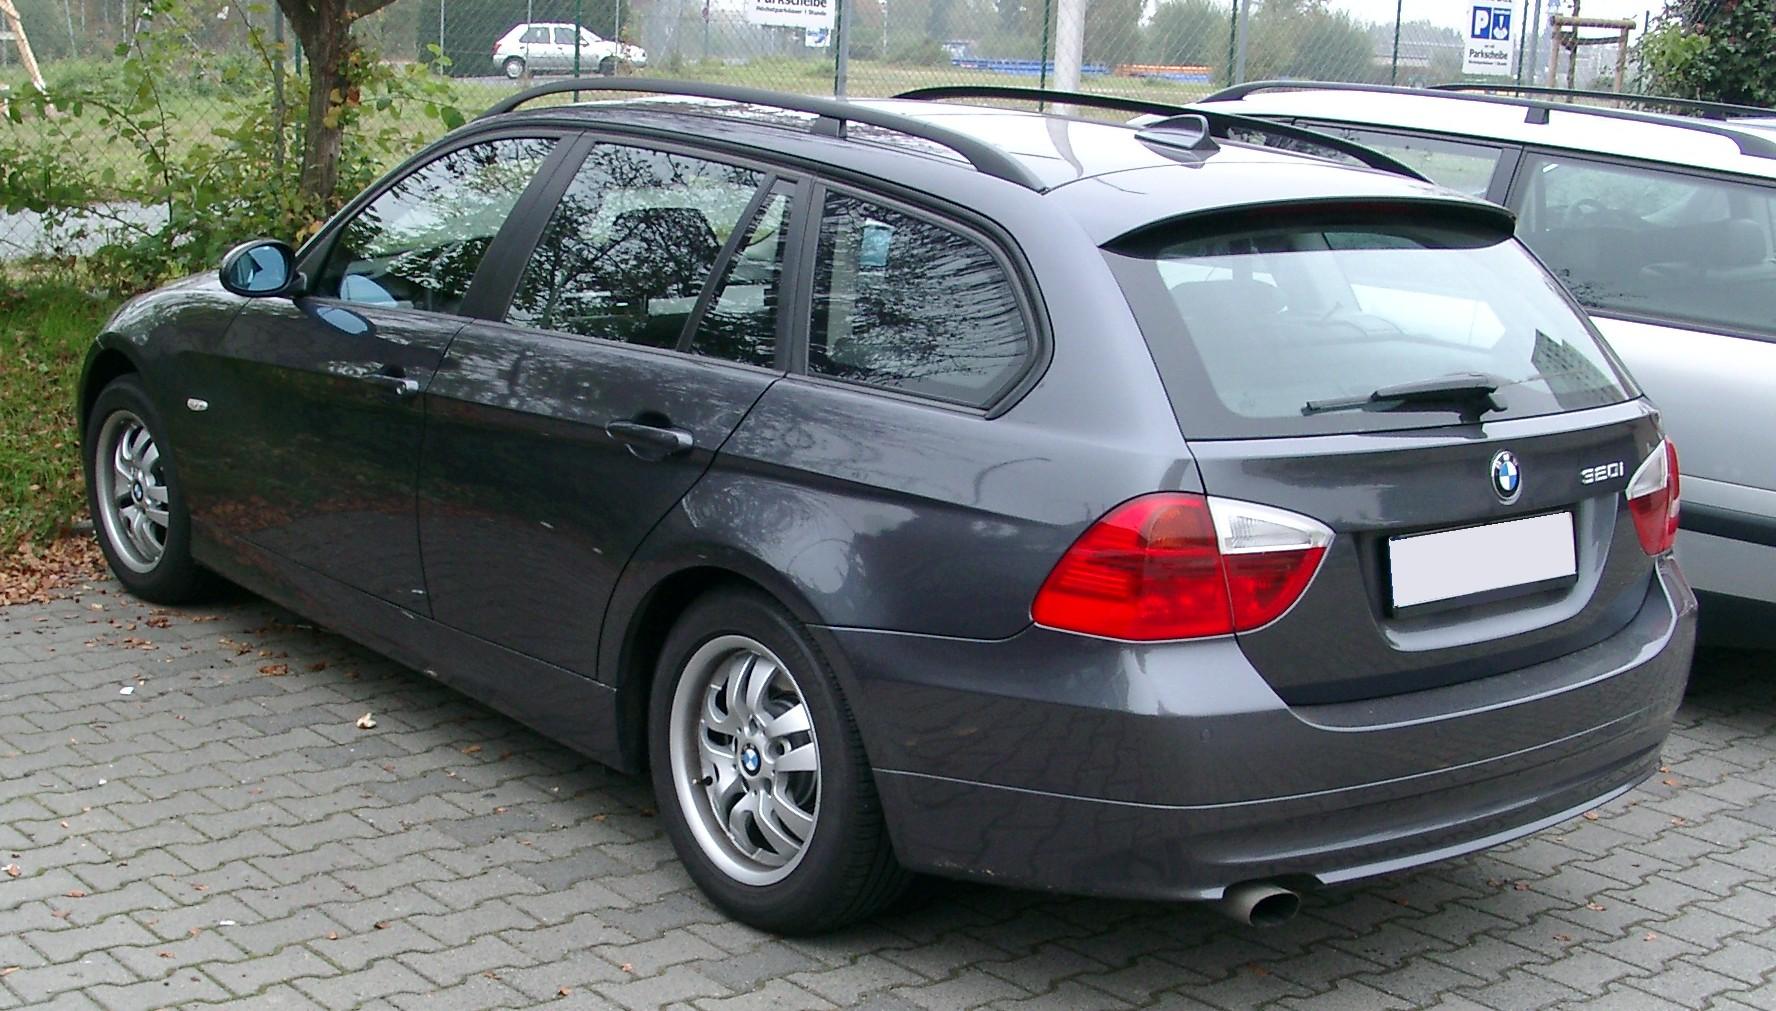 Bmw E90 Wiki >> File:BMW E90 Kombi rear 20071012.jpg - Wikimedia Commons